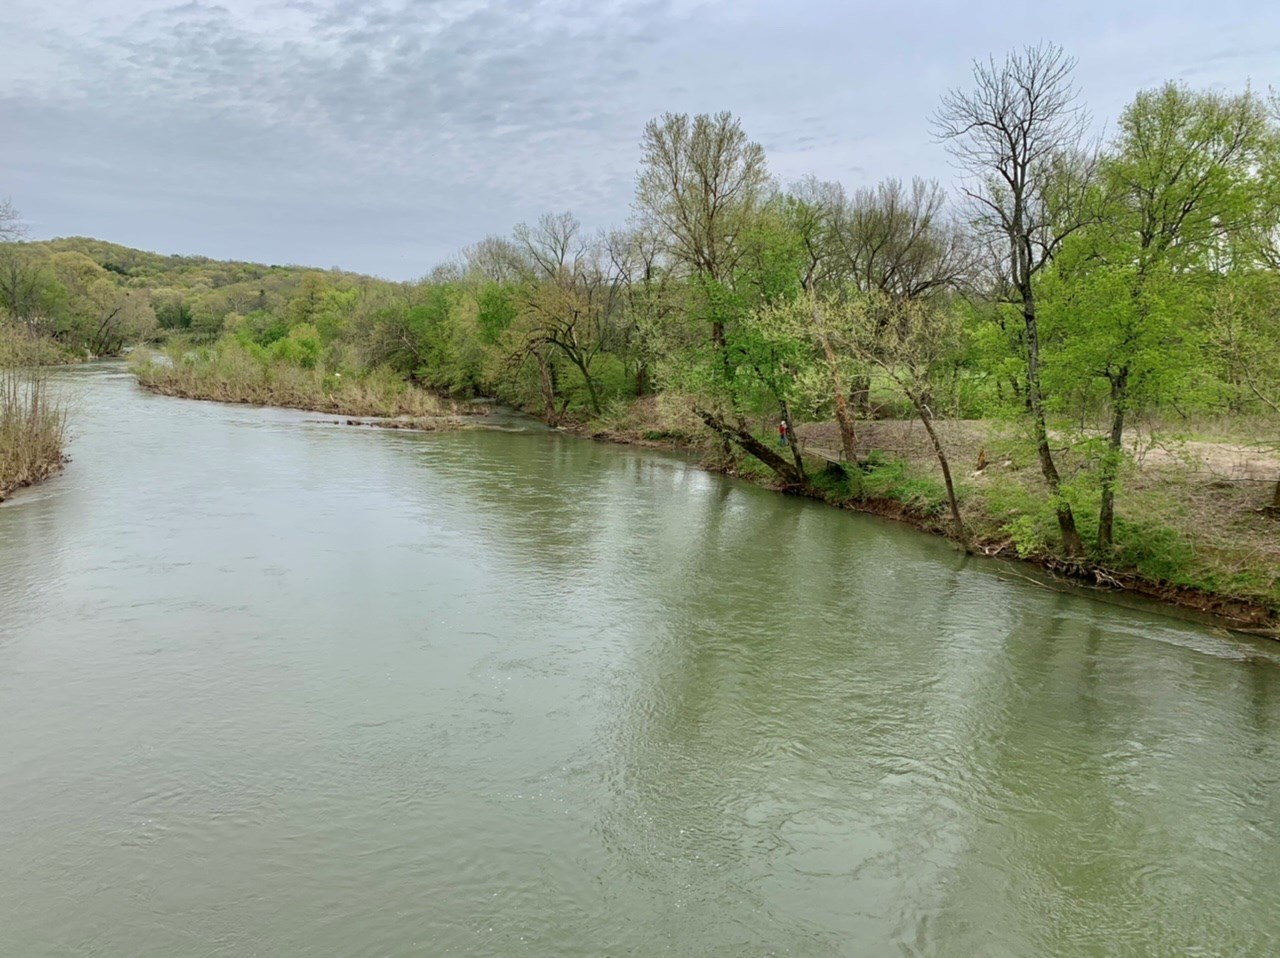 Spring River Property For Sale in Arkansas